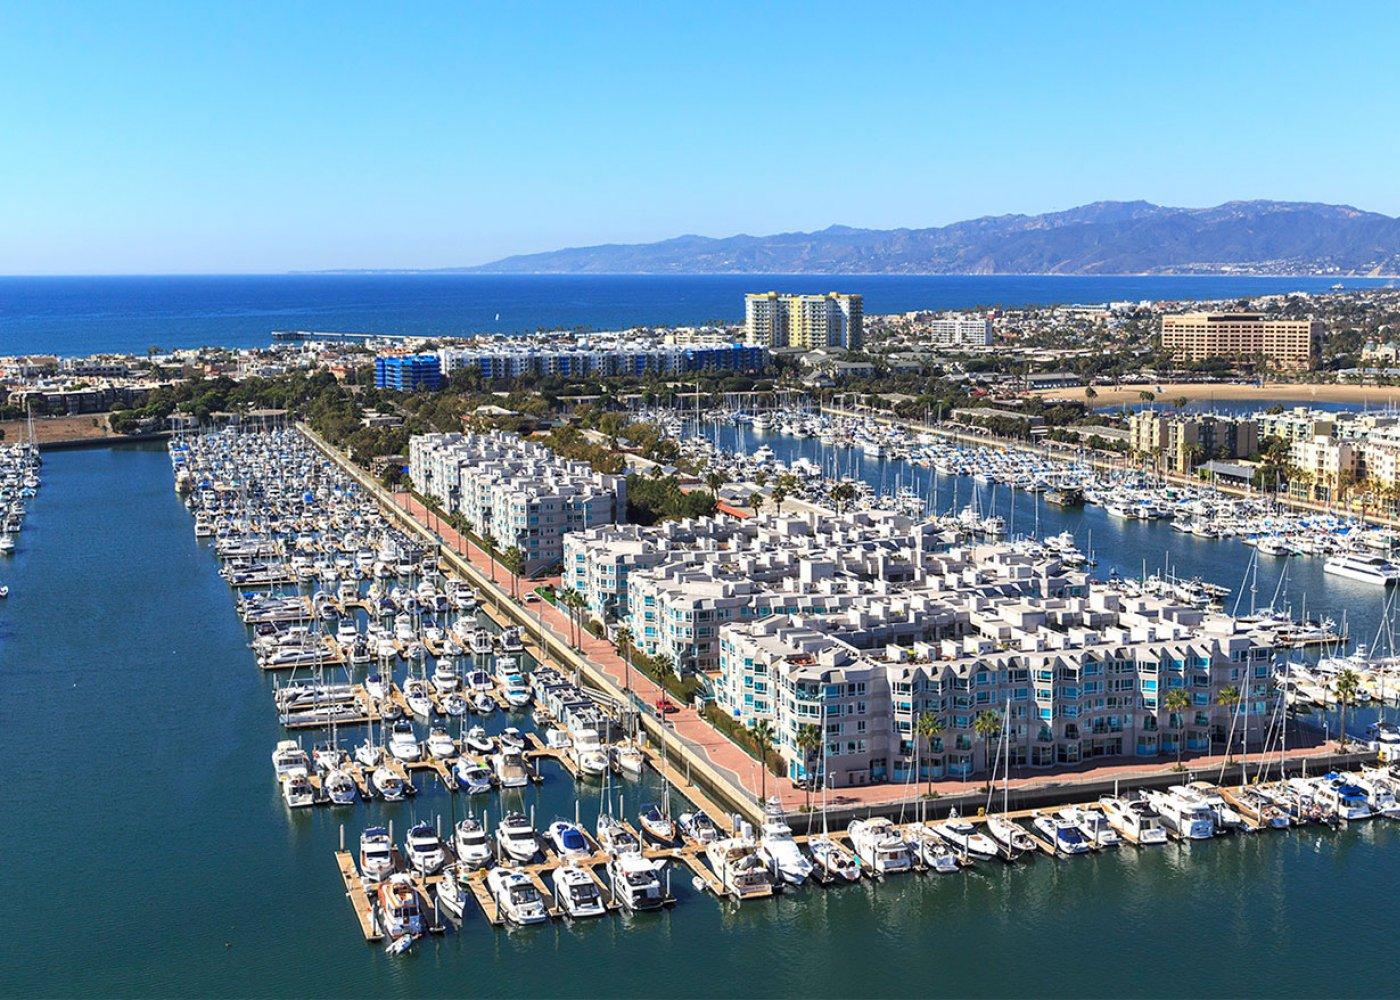 Marina Del Rey harbors great for bubble soccer